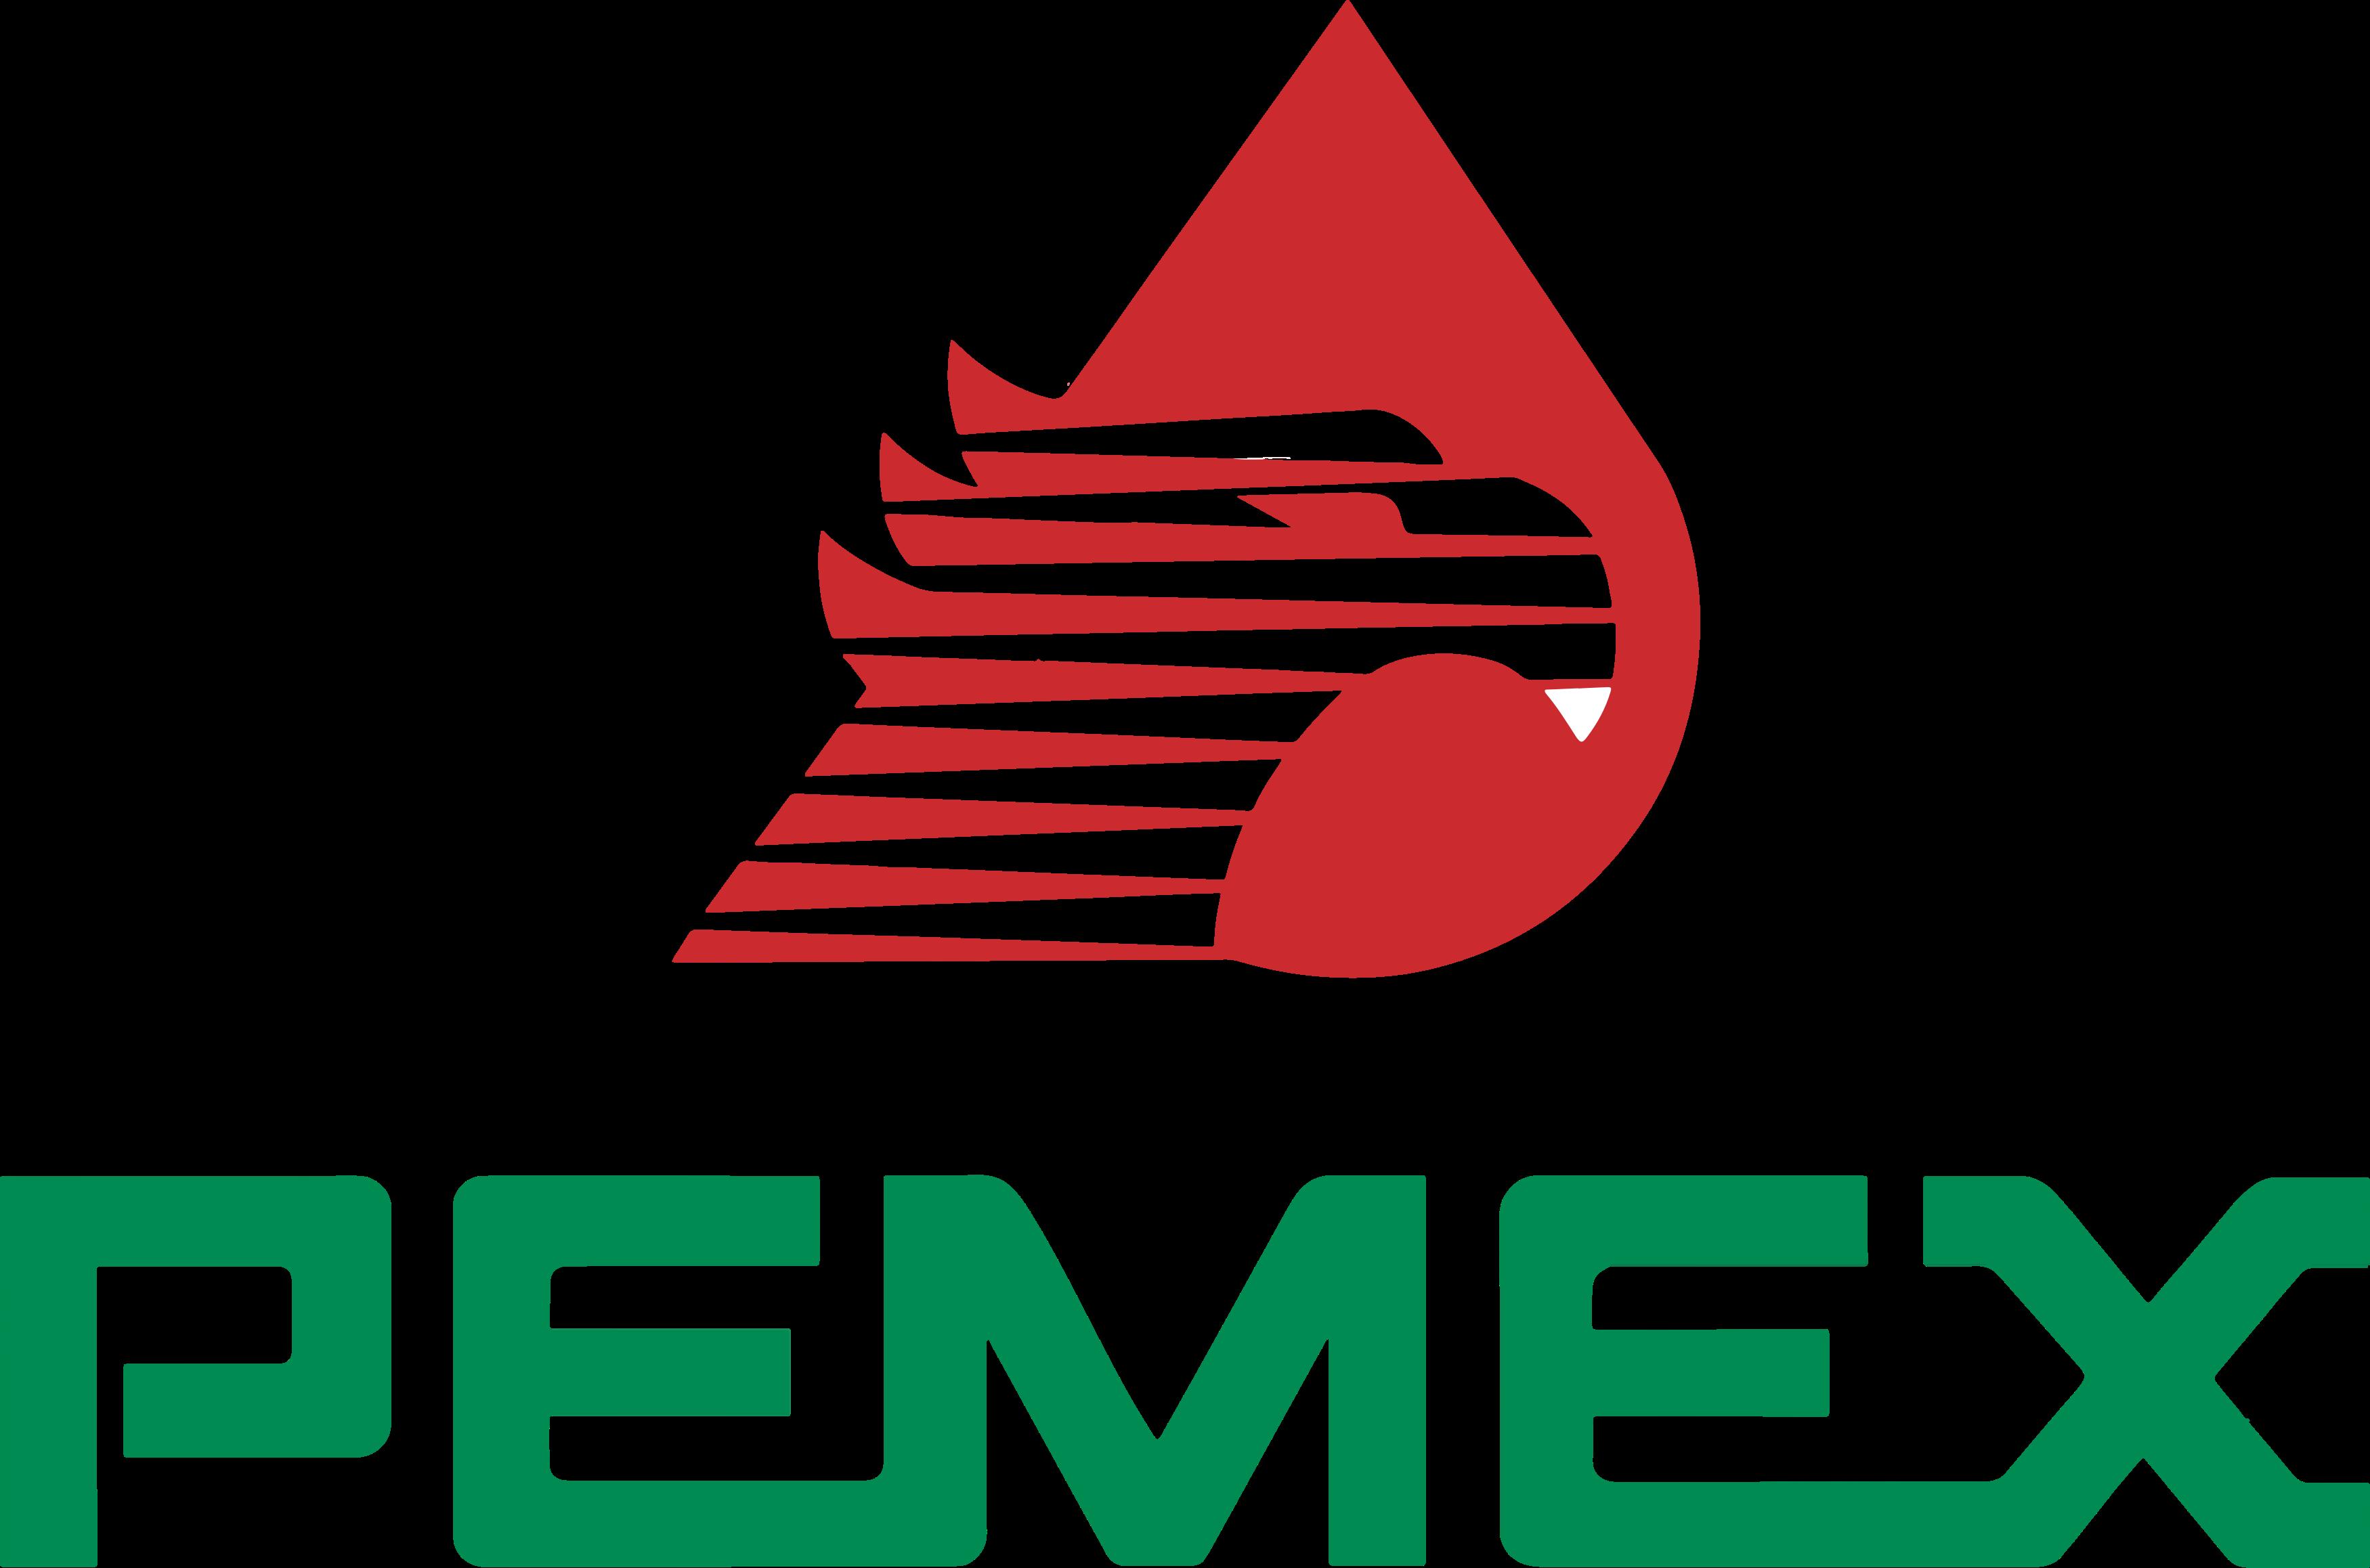 https://0201.nccdn.net/1_2/000/000/0c8/e7f/pemex-logo.png